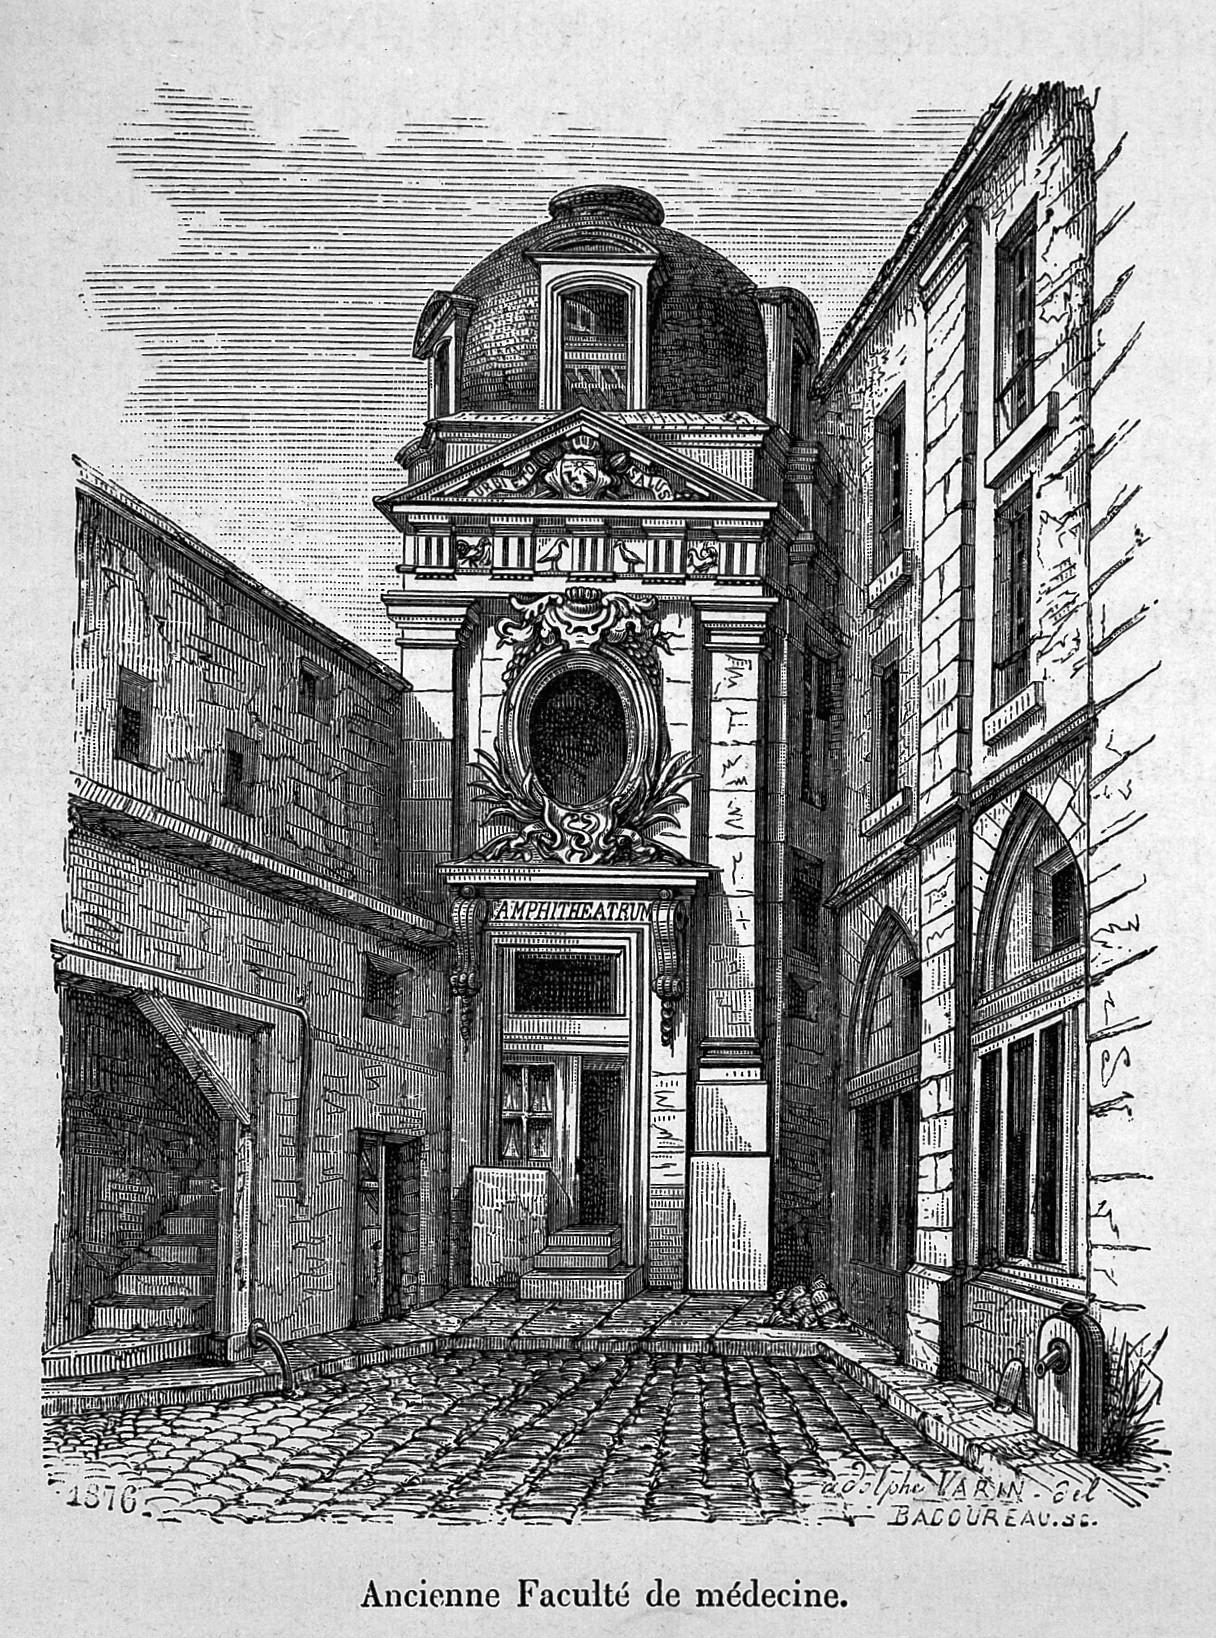 image of Faculté de médecine de Paris